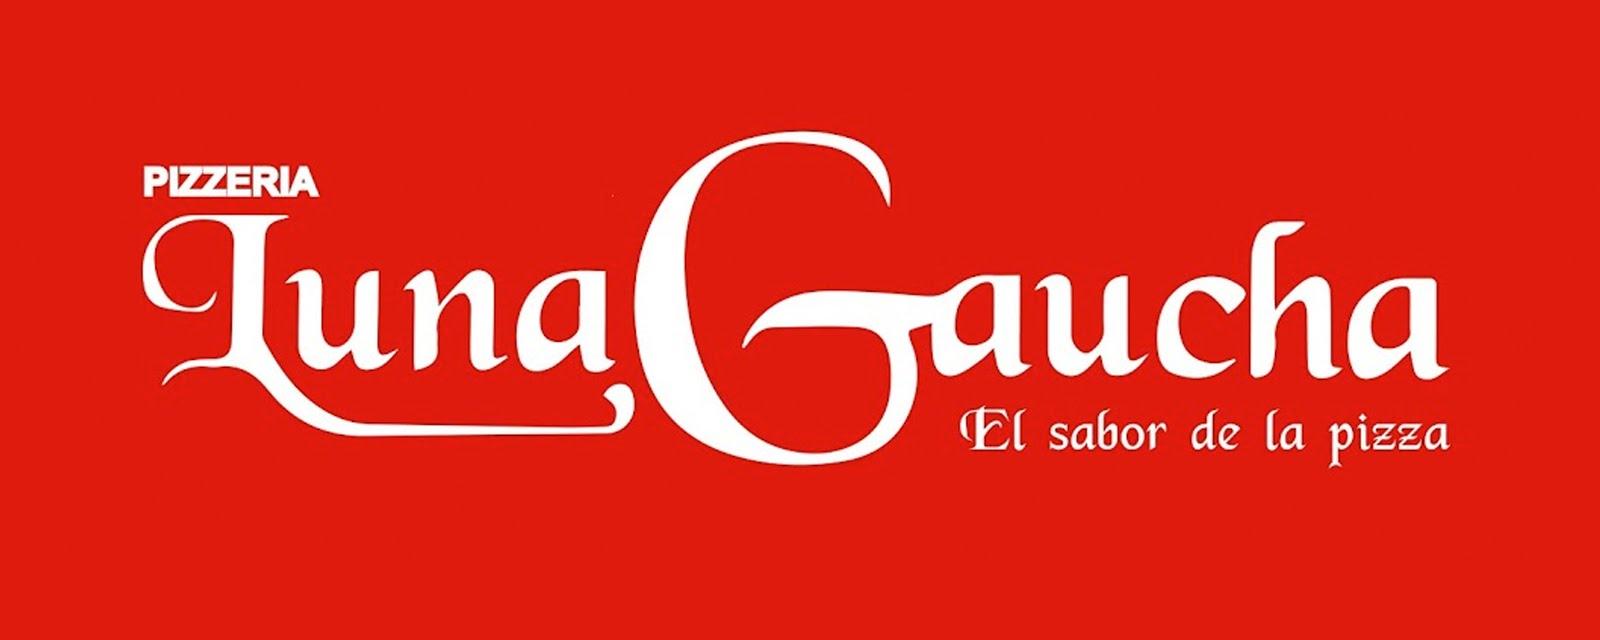 Pizzeria Luna Gaucha